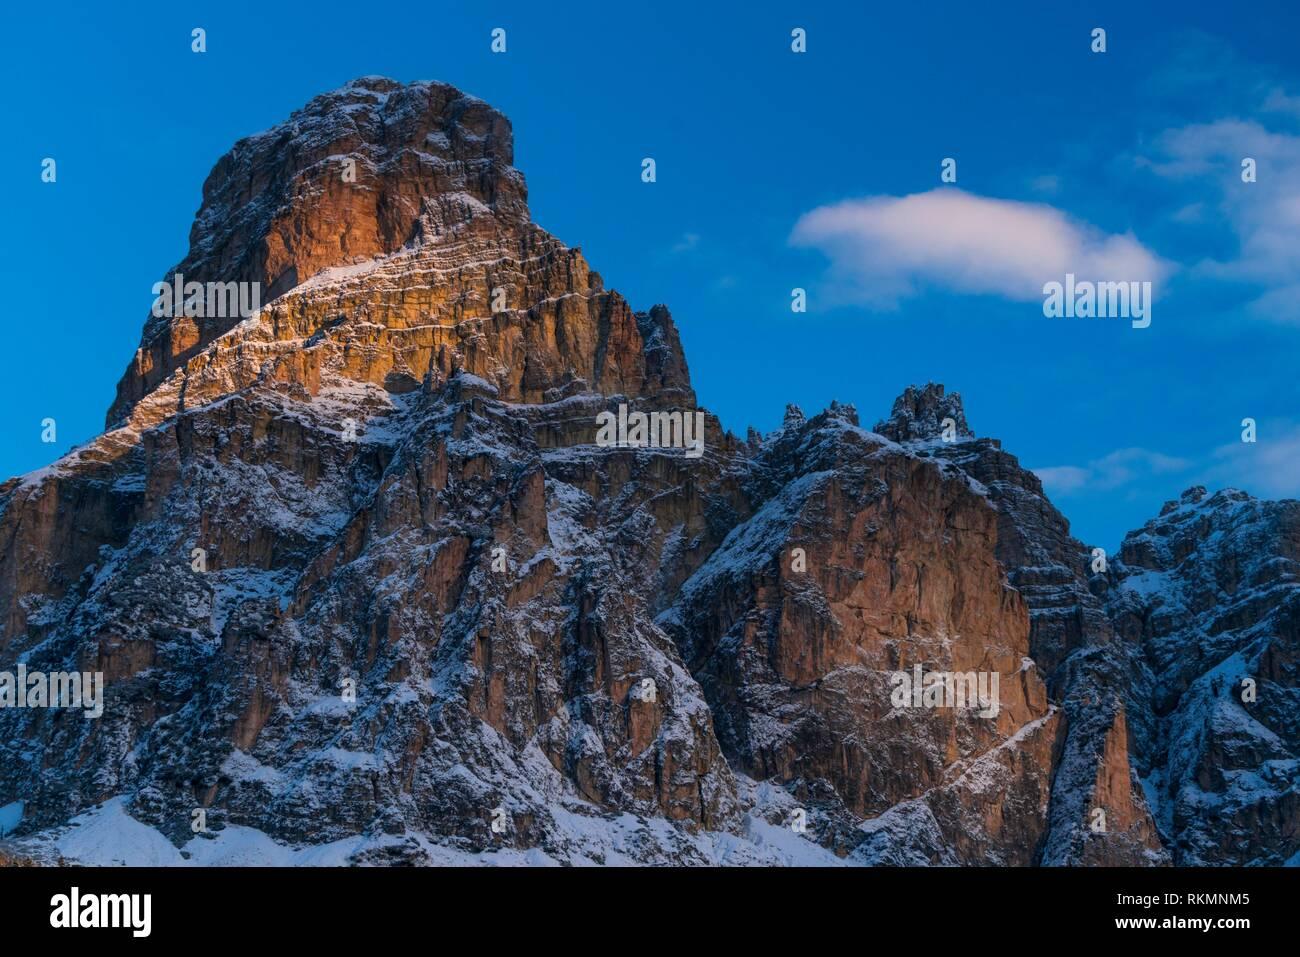 Sasshonger Mountain, Corvara in Badia, Bolzano Province, Dolomites, Italy, Europe. - Stock Image